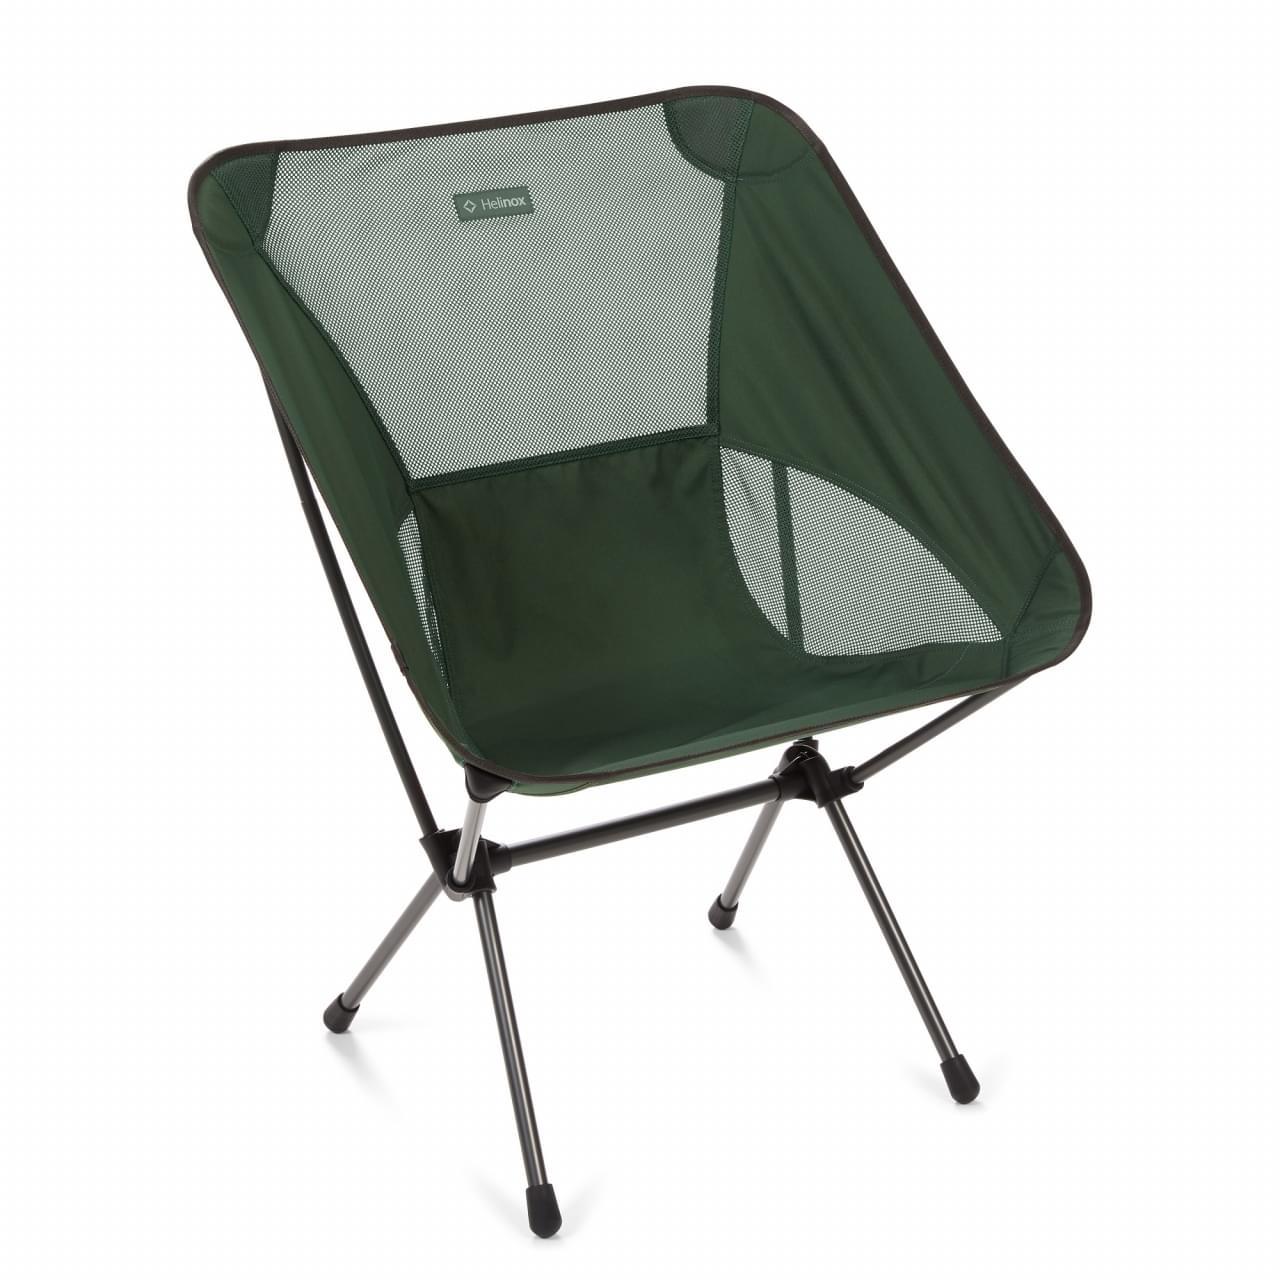 Helinox Chair One XL Lichtgewicht Stoel - Groen